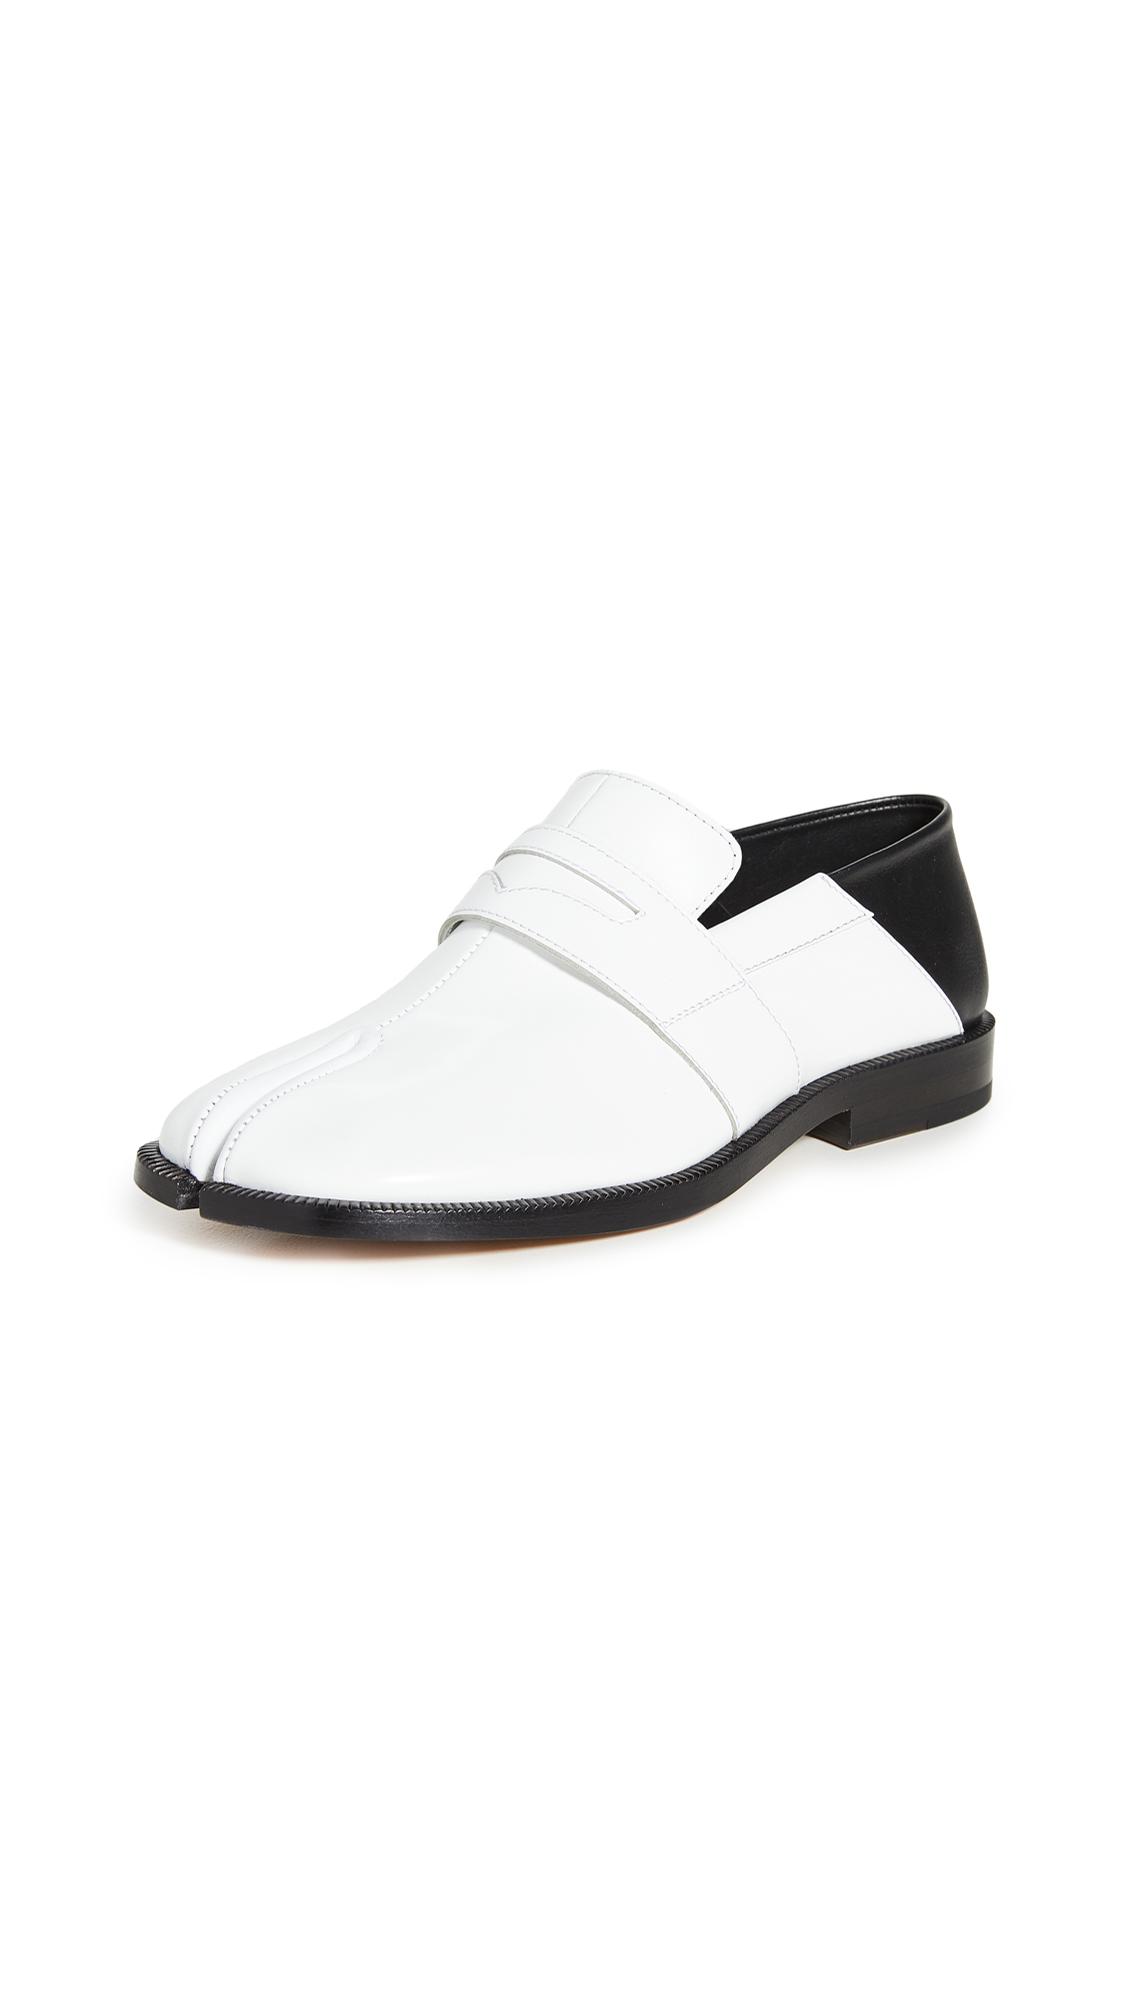 Buy Maison Margiela Tabi Penny Loafers online, shop Maison Margiela